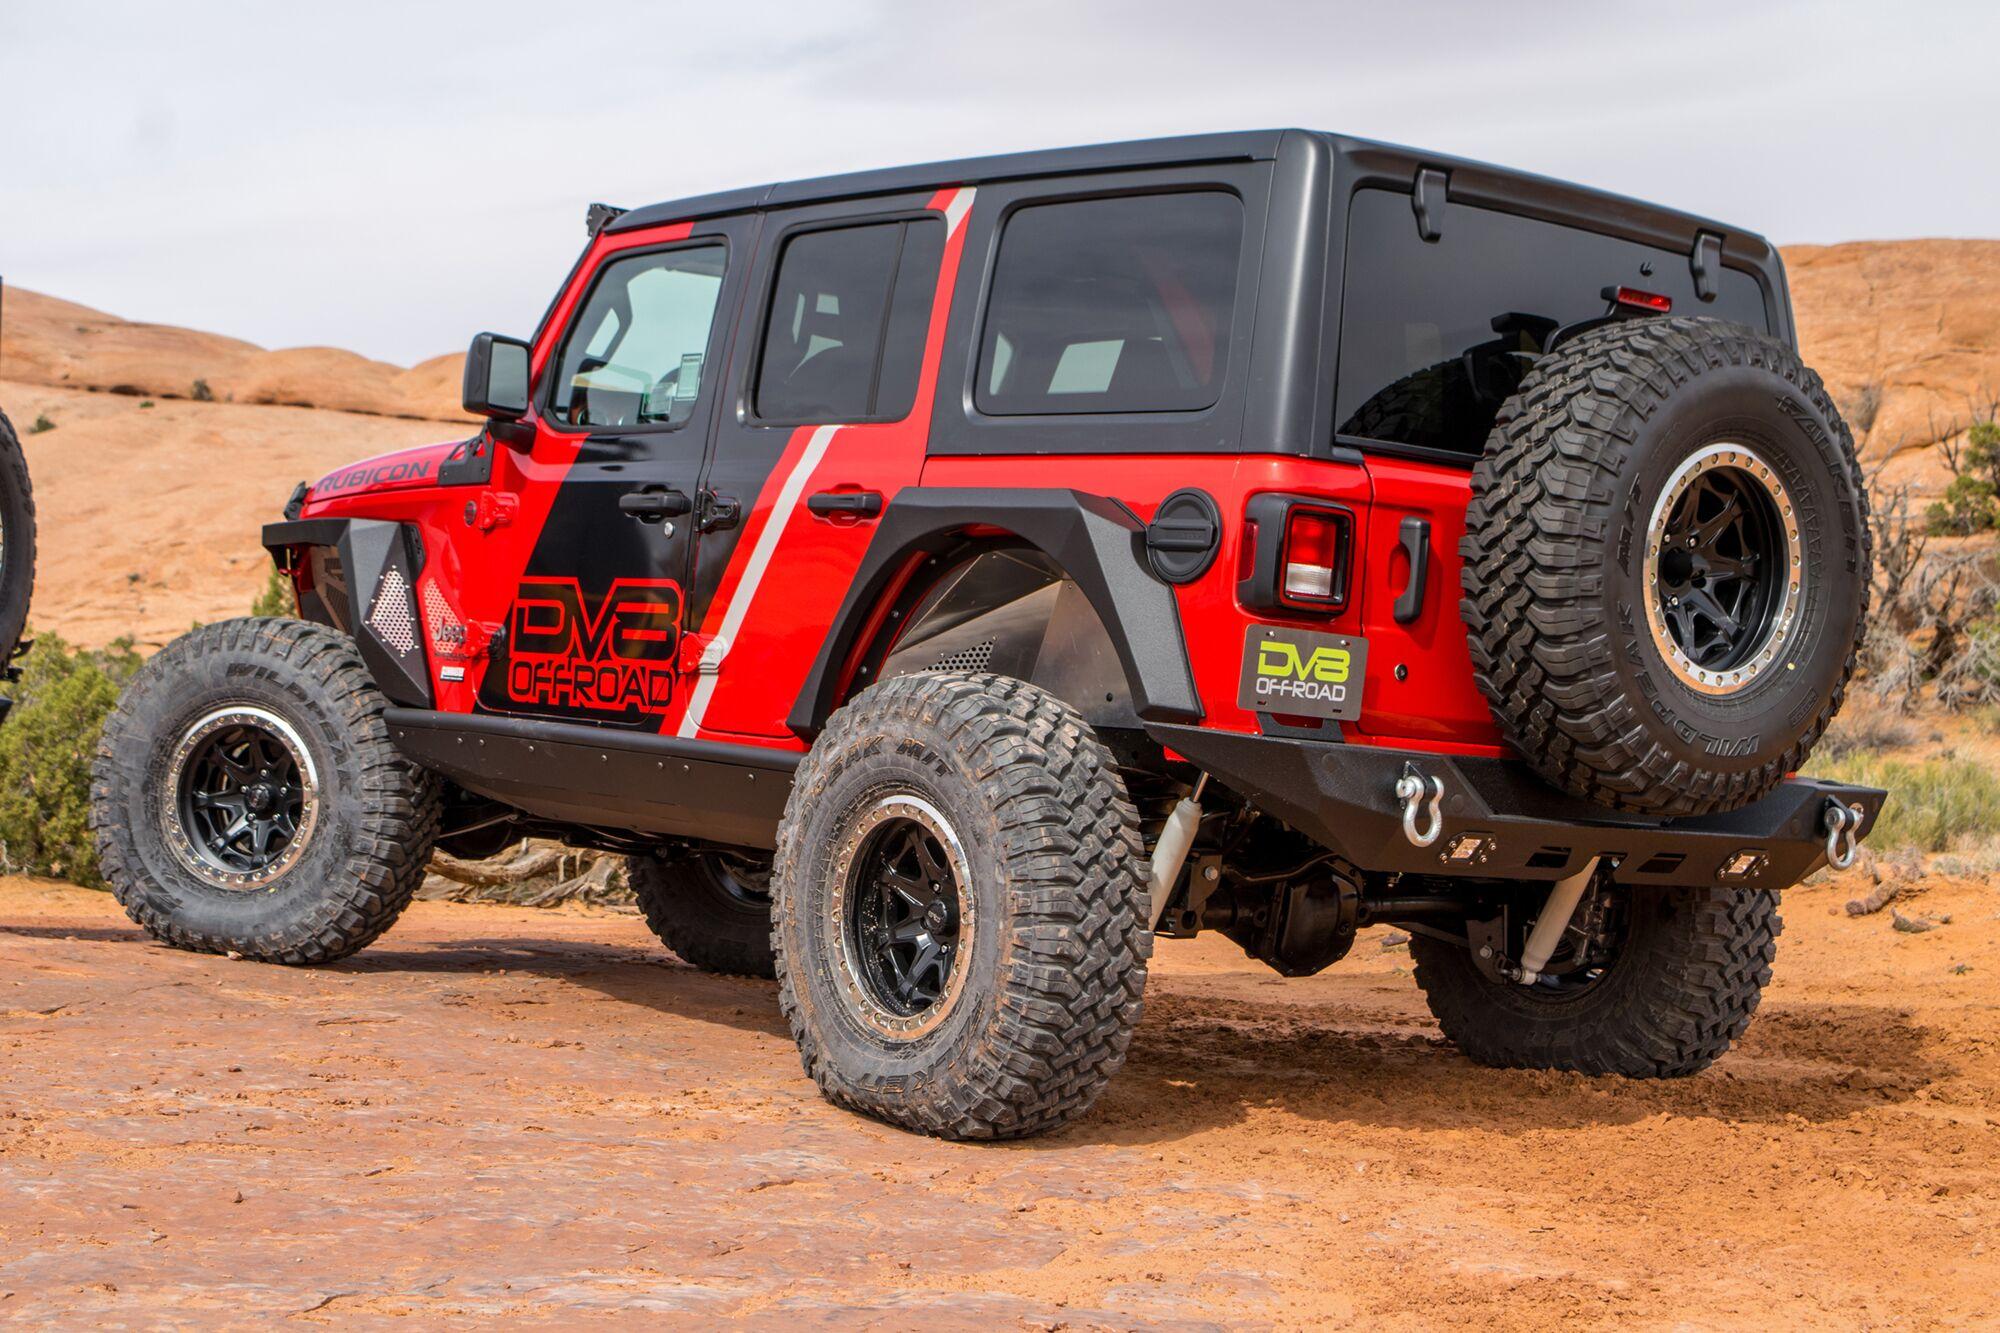 Jeep JL Inner Fenders (Rear Raw) 18-Present Wrangler JL DV8 Offroad